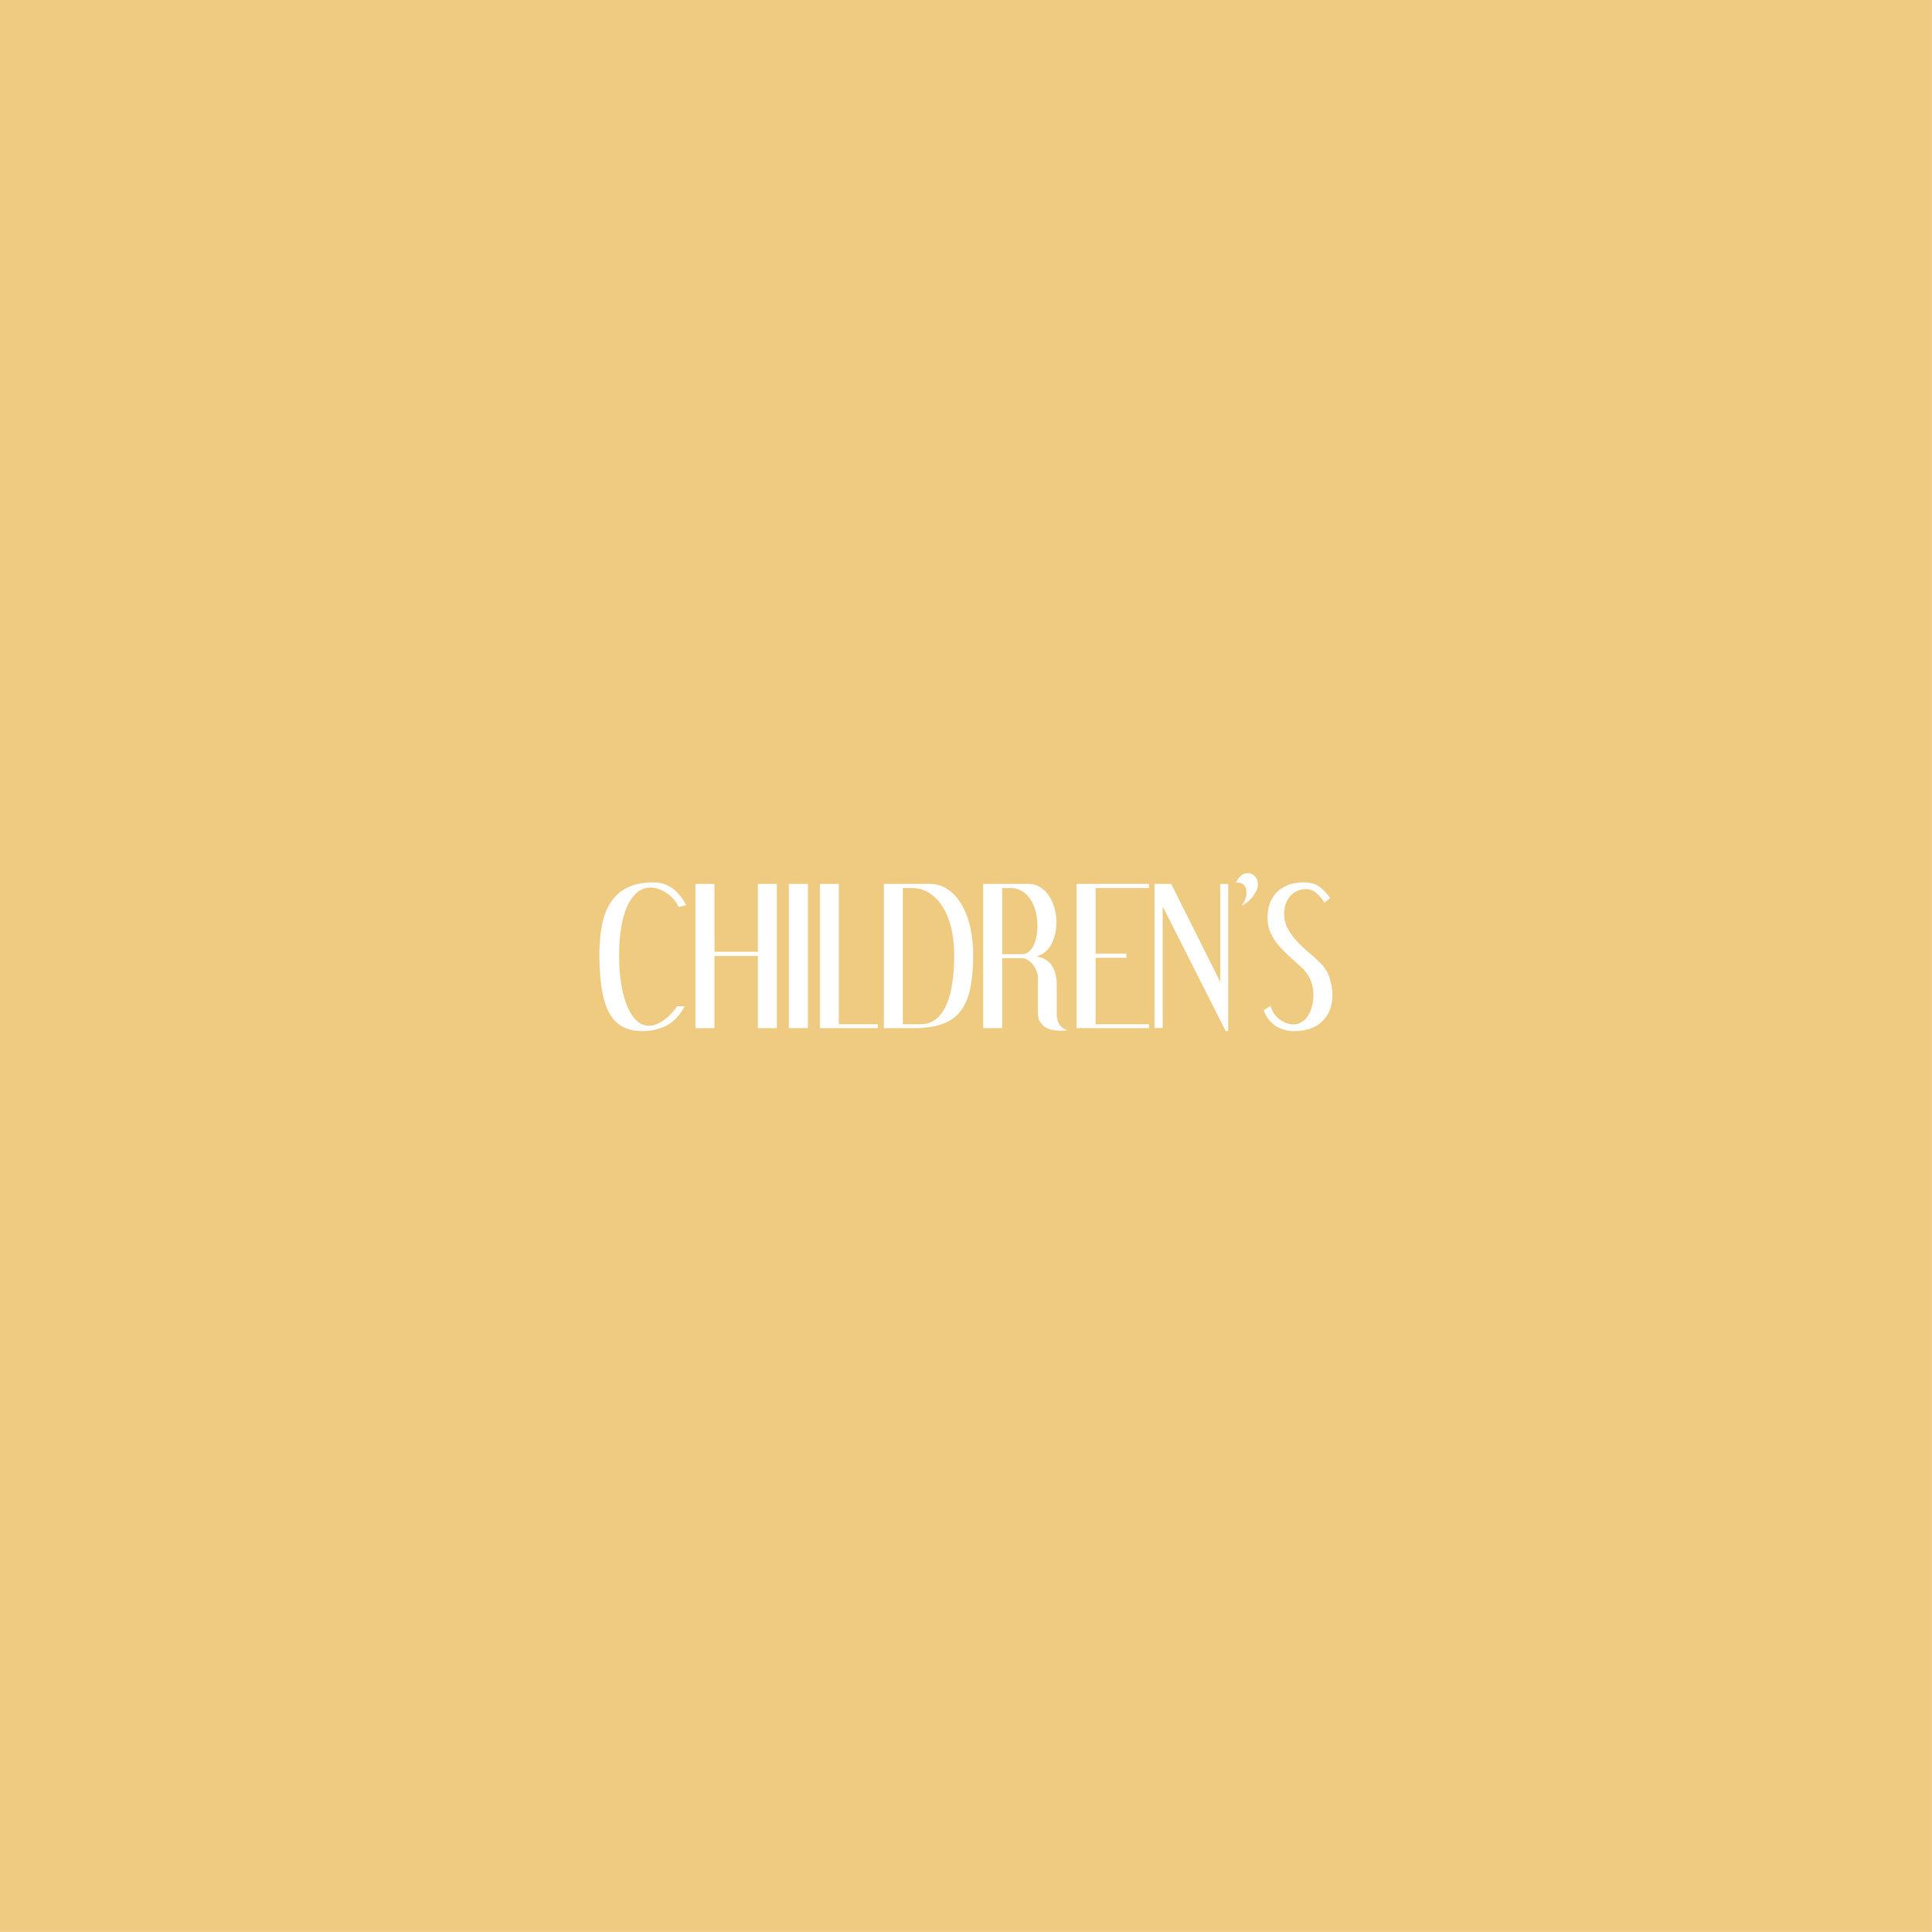 childrens.jpg